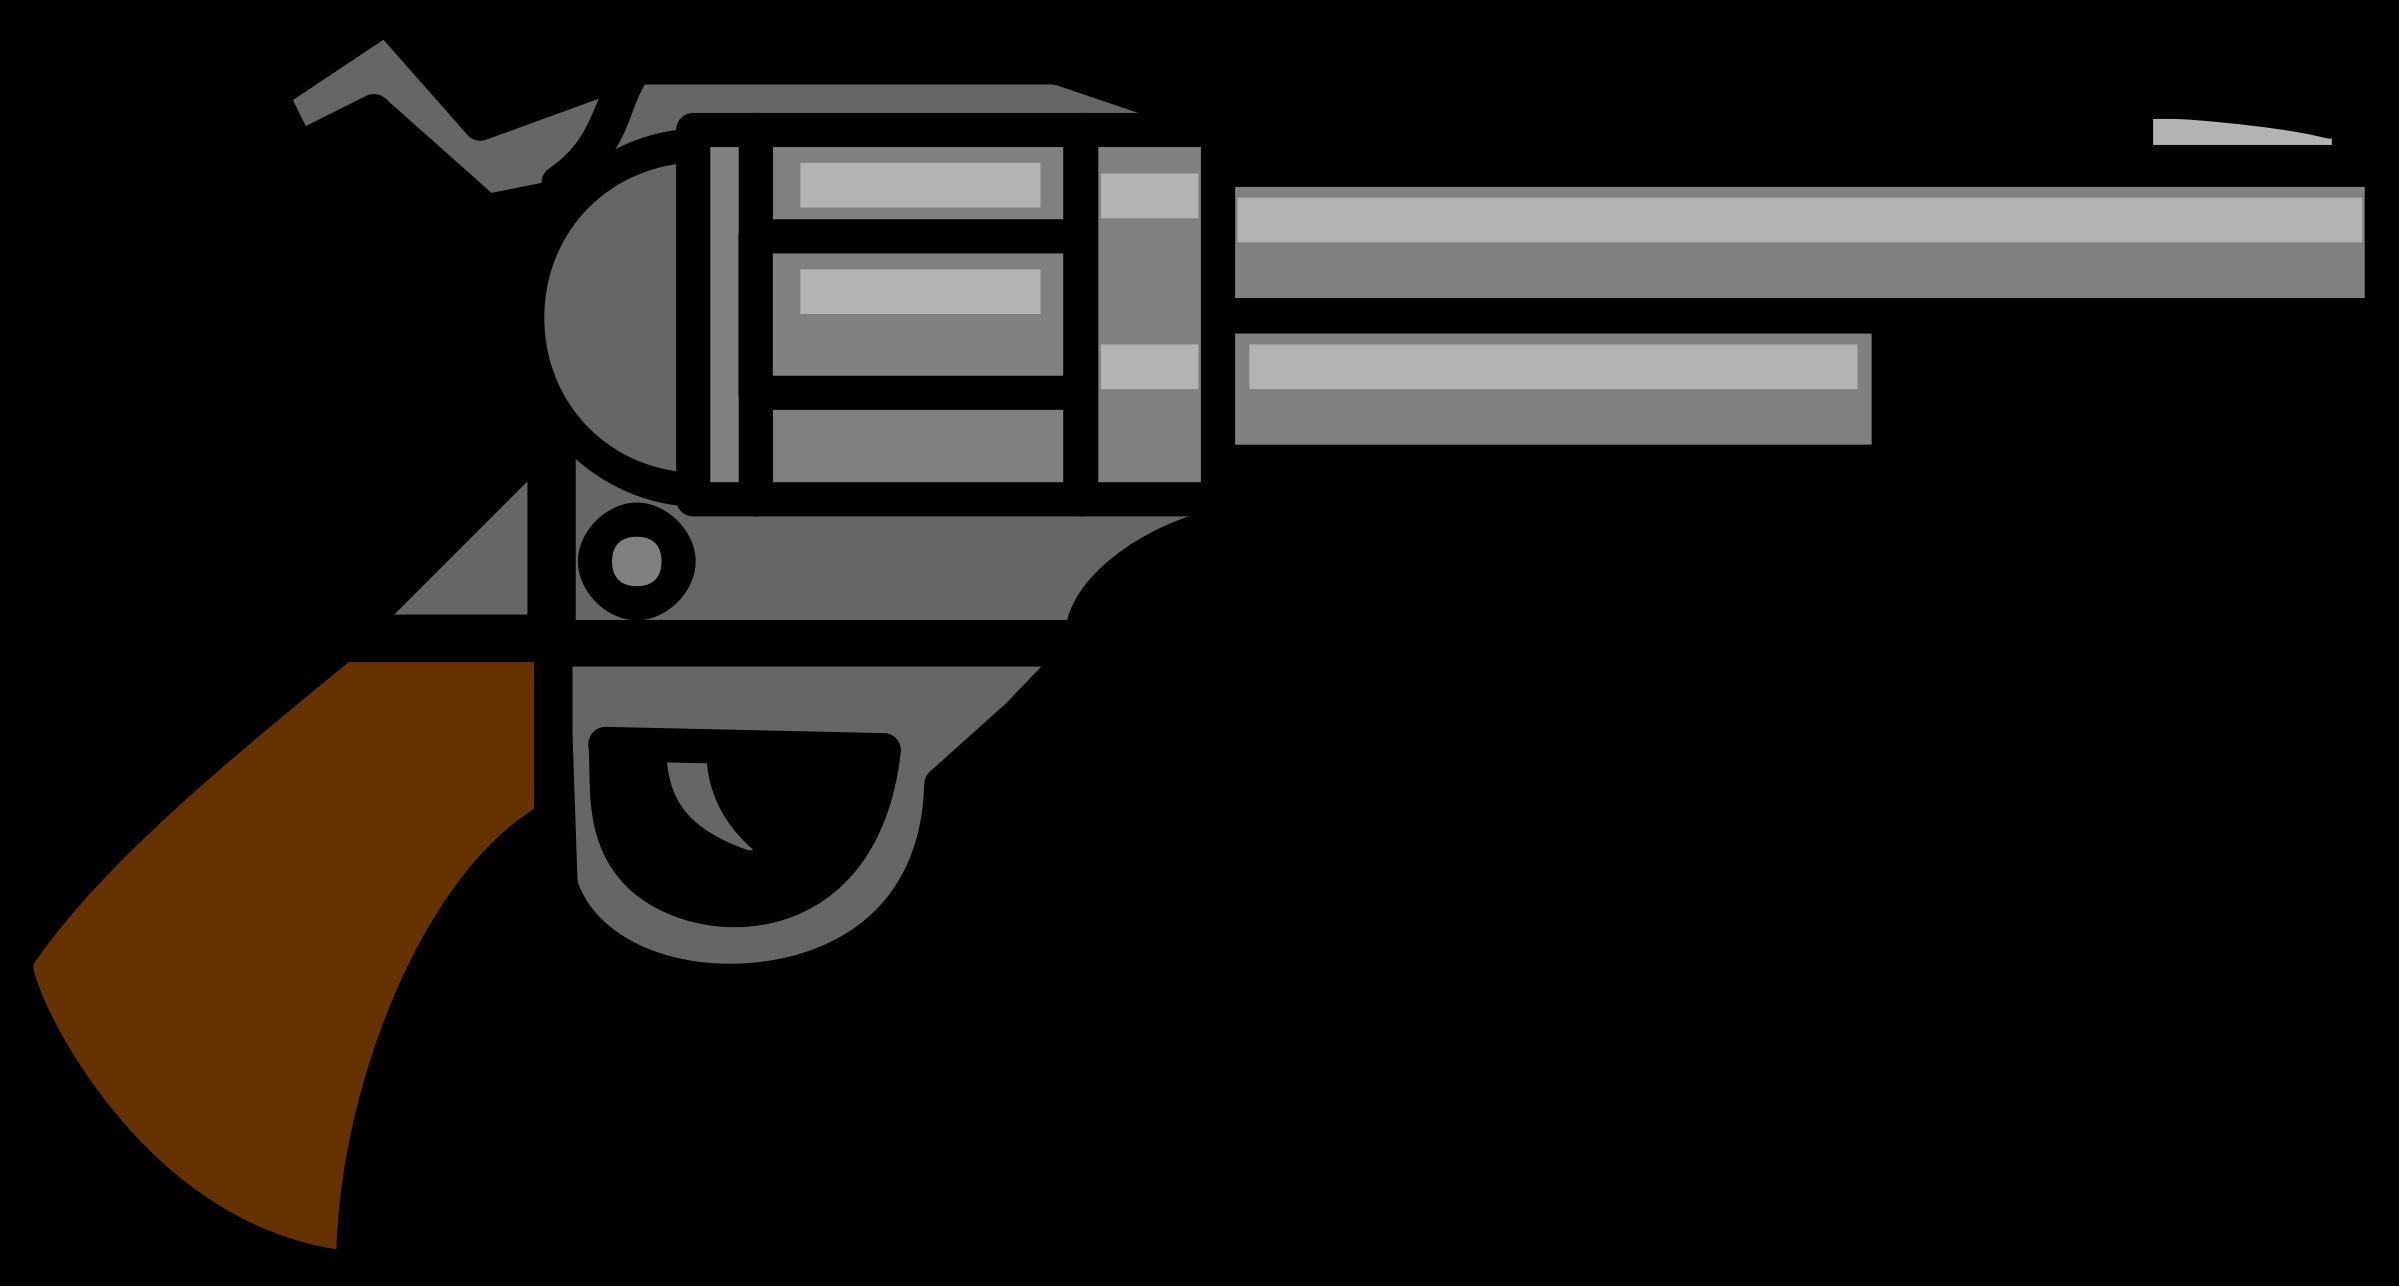 Big image png. Clipart gun